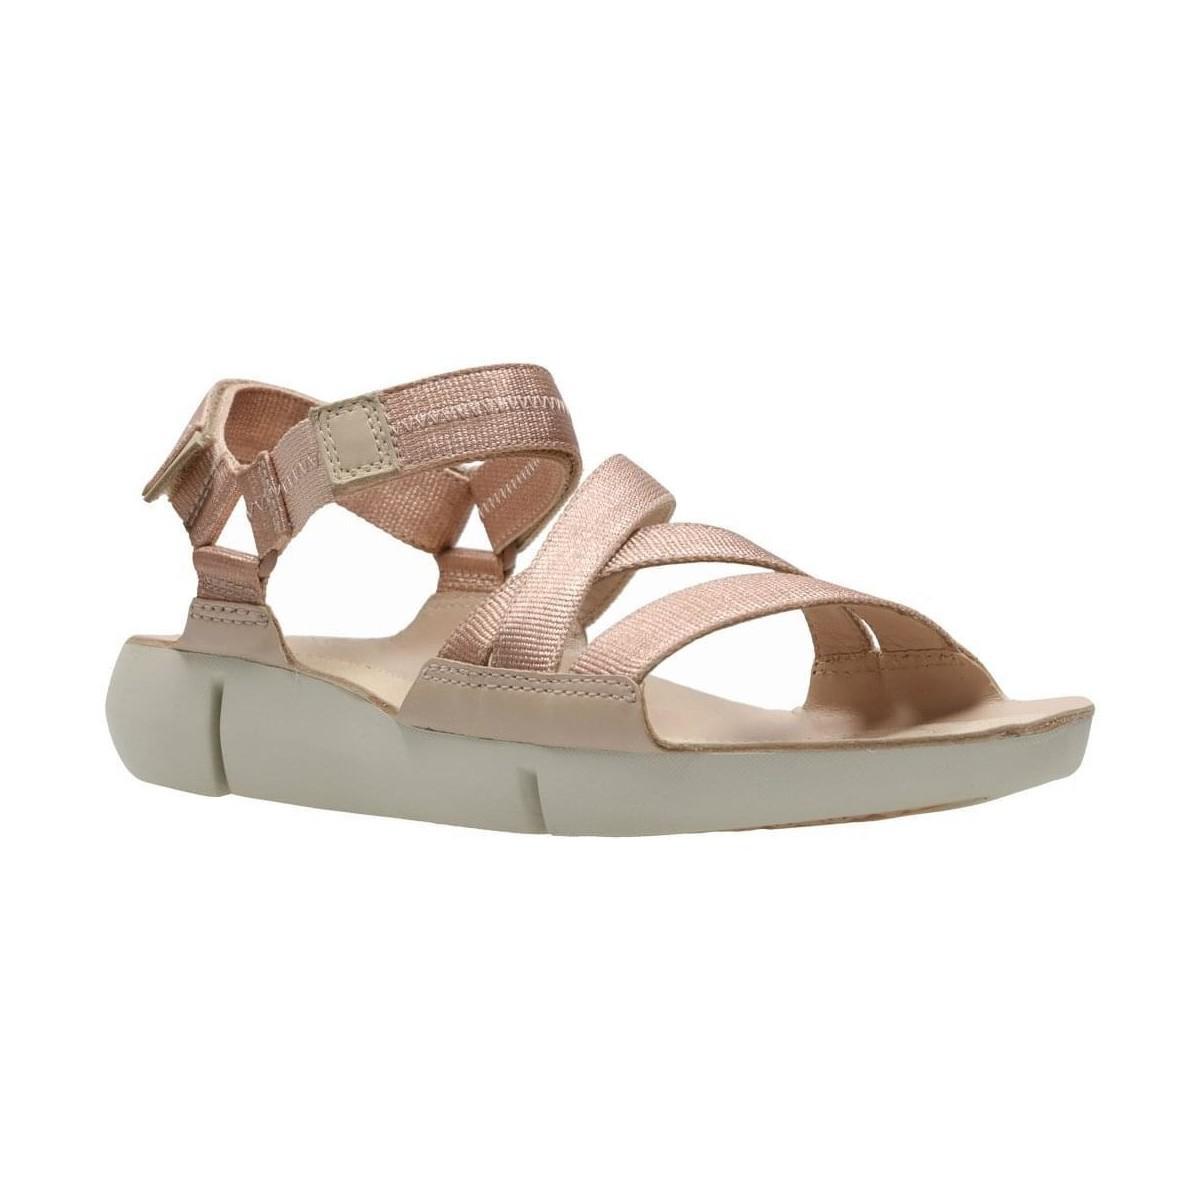 3365cf7043ba41 Clarks Tri Sienna Womens Strappy Sandal Women s Sandals In Pink in ...